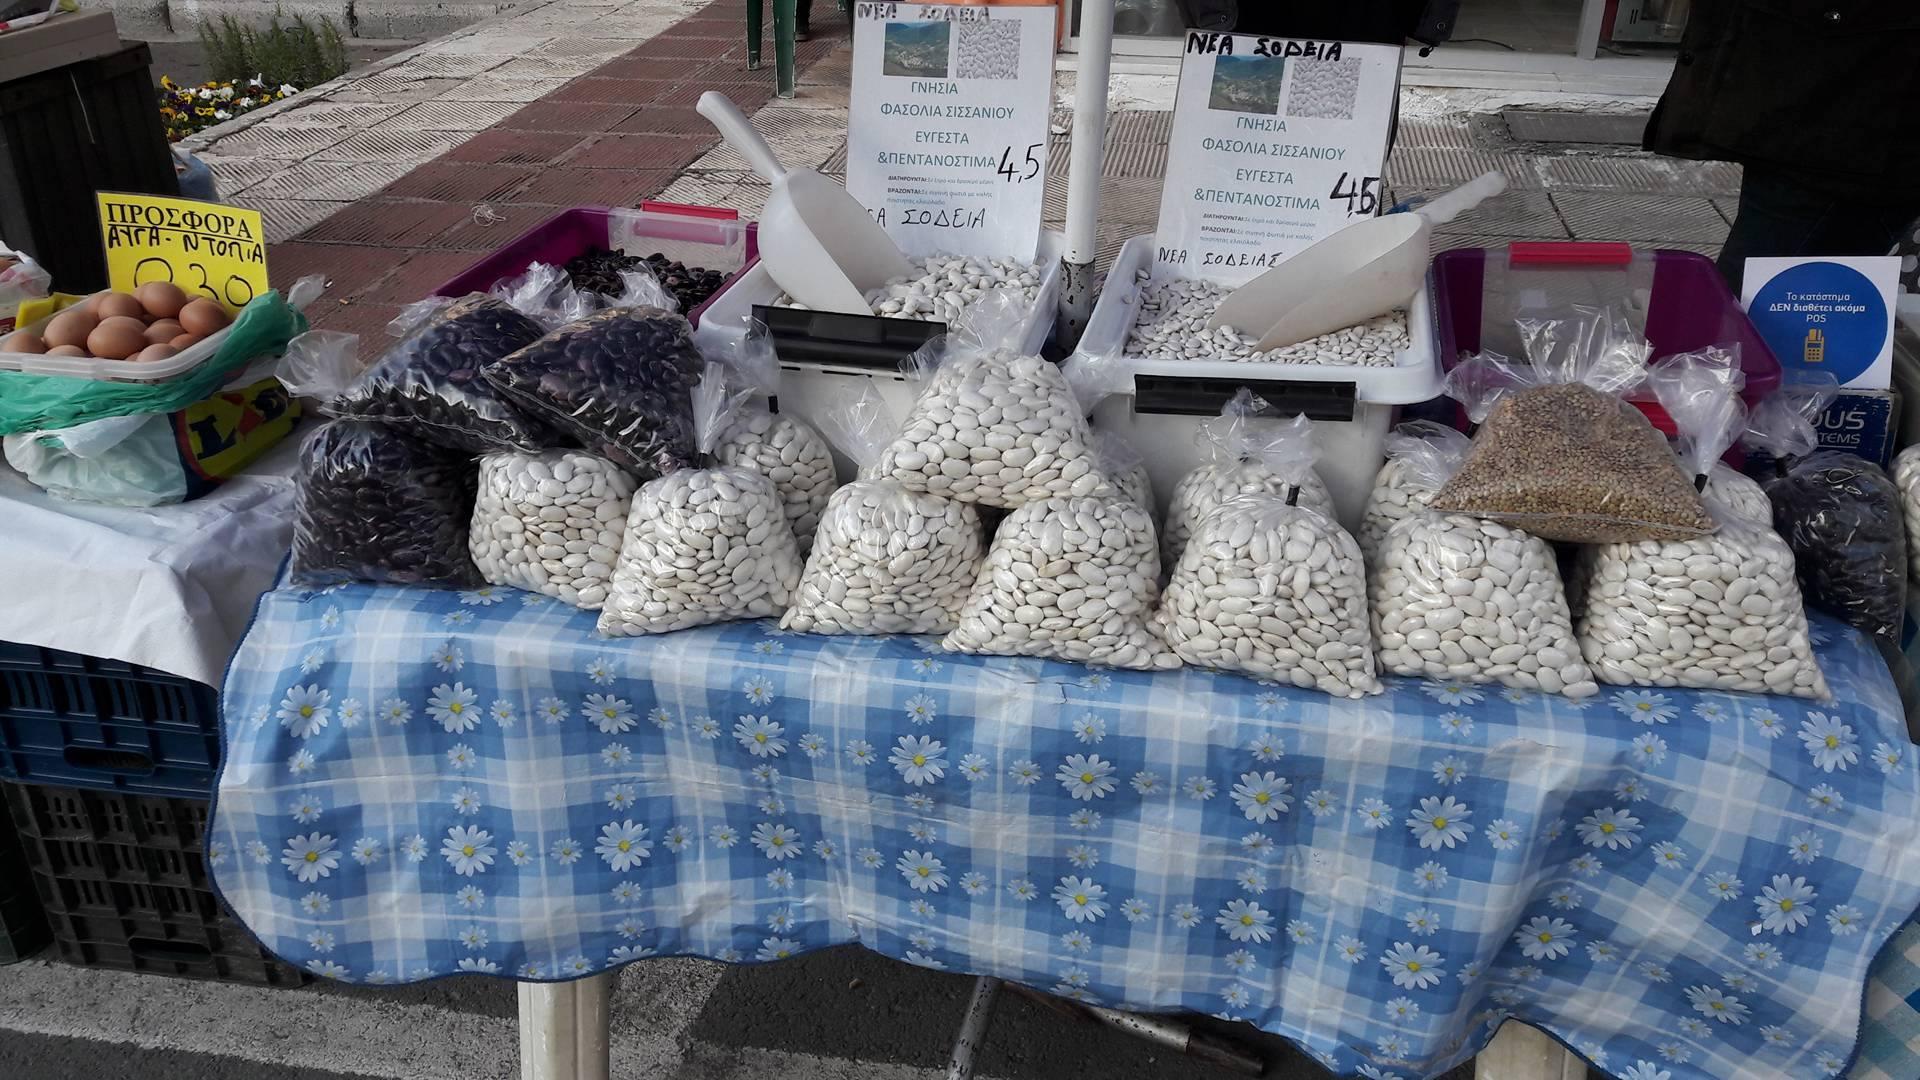 kozan.gr: Μια πρωινή βόλτα, σήμερα Σάββατο 18/2, στη λαϊκή αγορά της Κοζάνης – Οι τιμές στους πάγκους των πωλητών